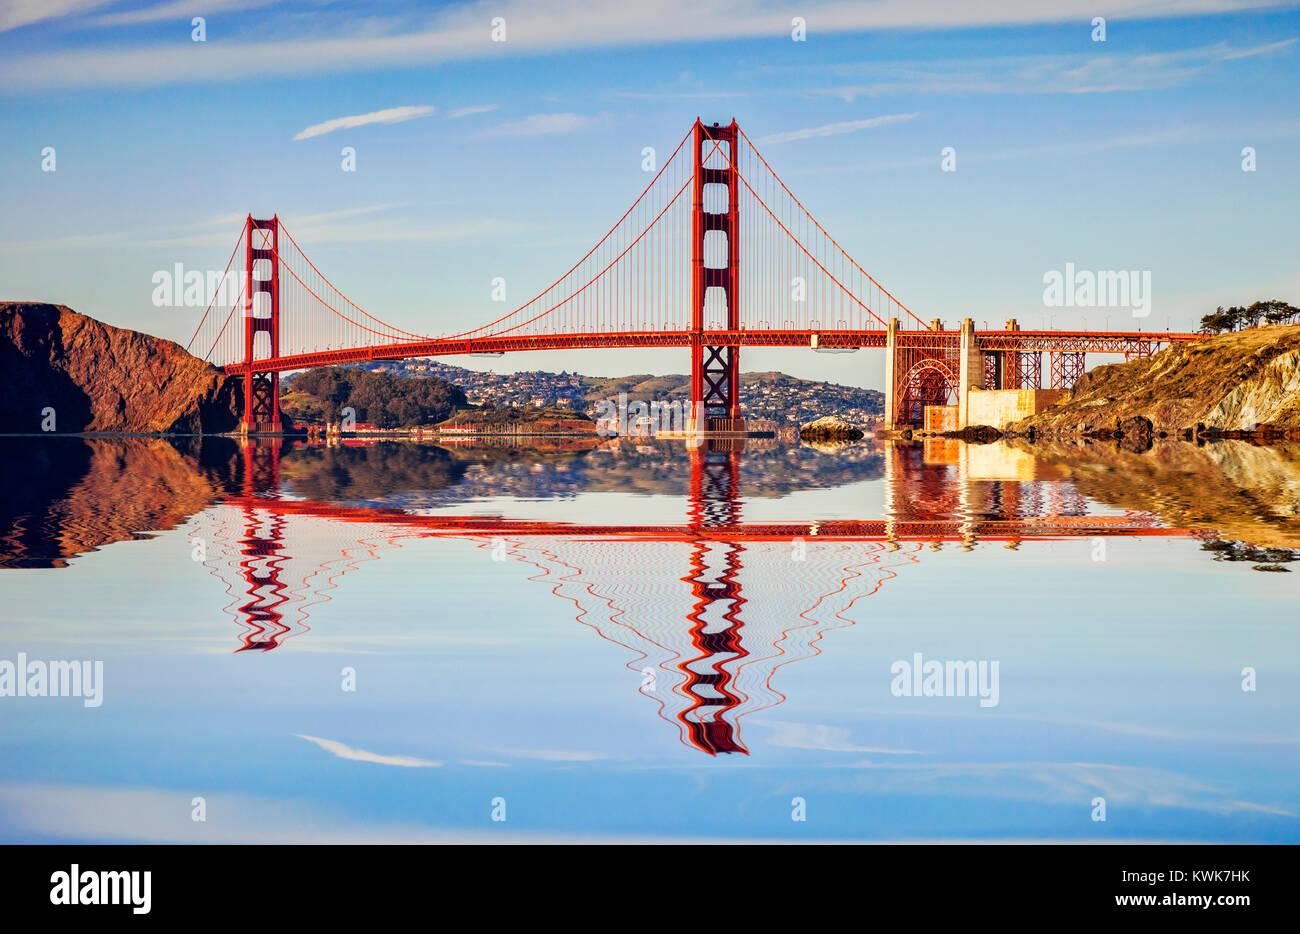 The Golden Gate Bridge, San Francisco, in late evening sun. - Stock Image